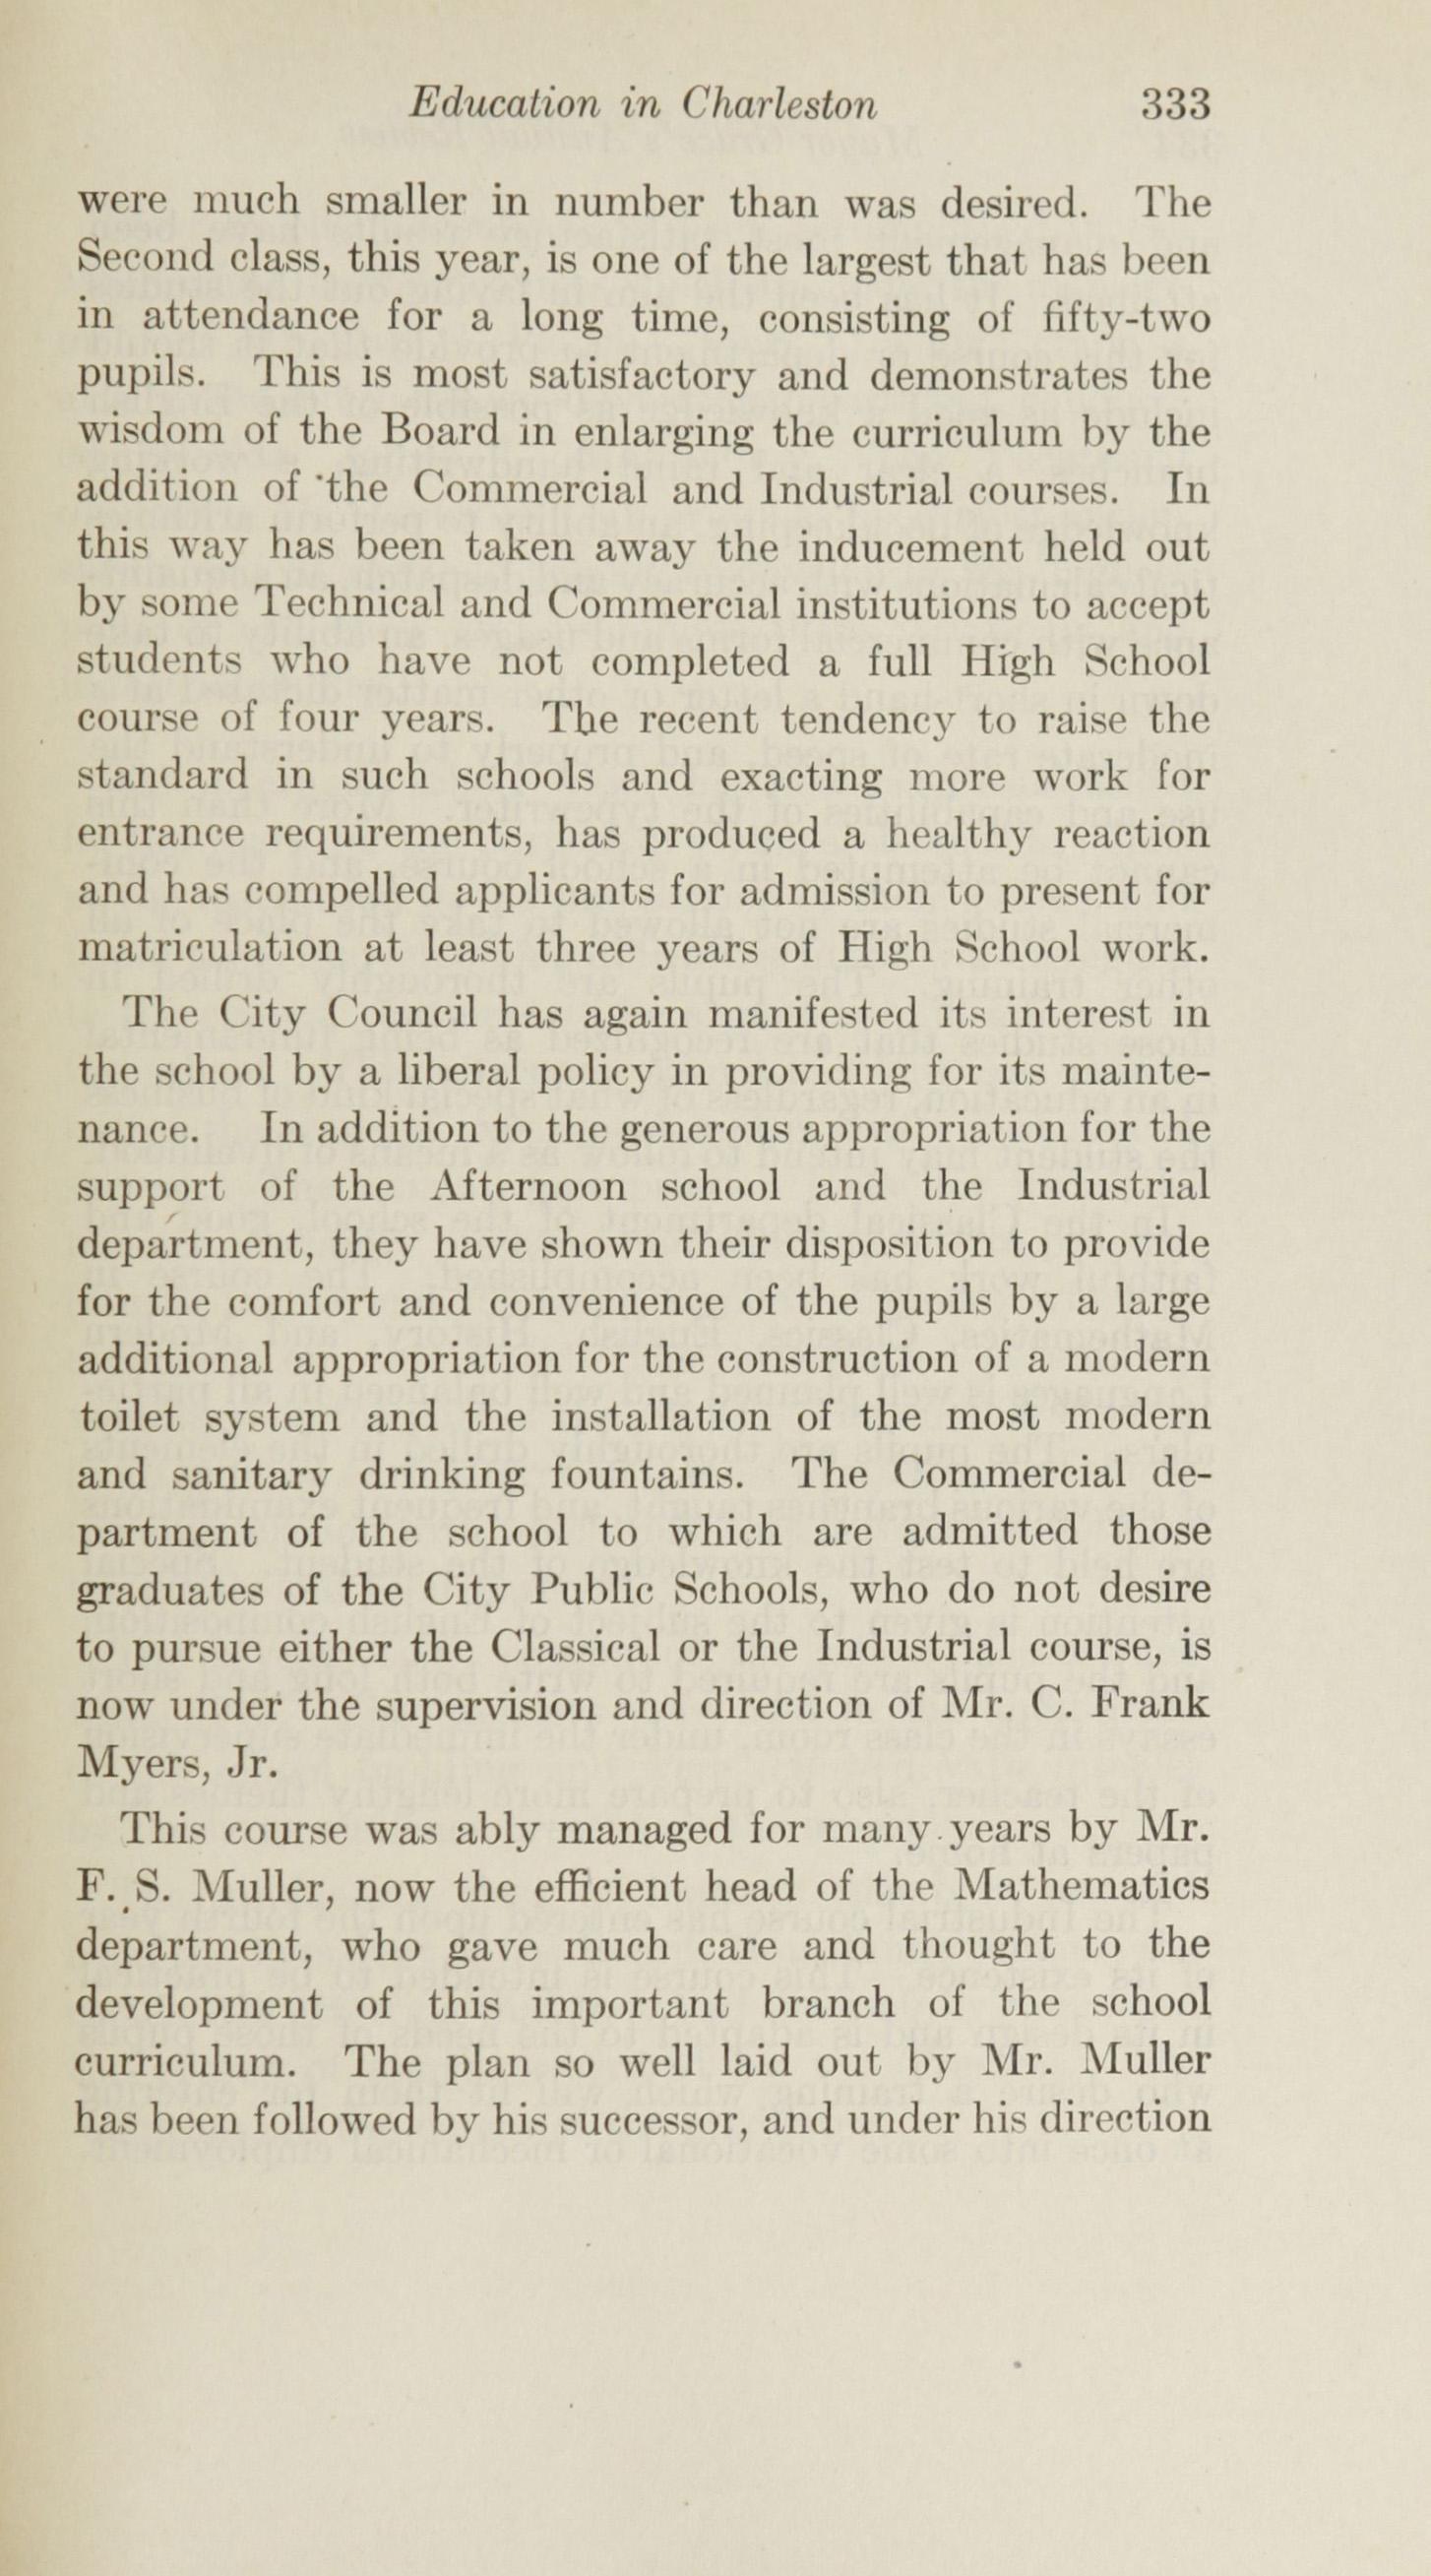 Charleston Yearbook, 1915, page 333